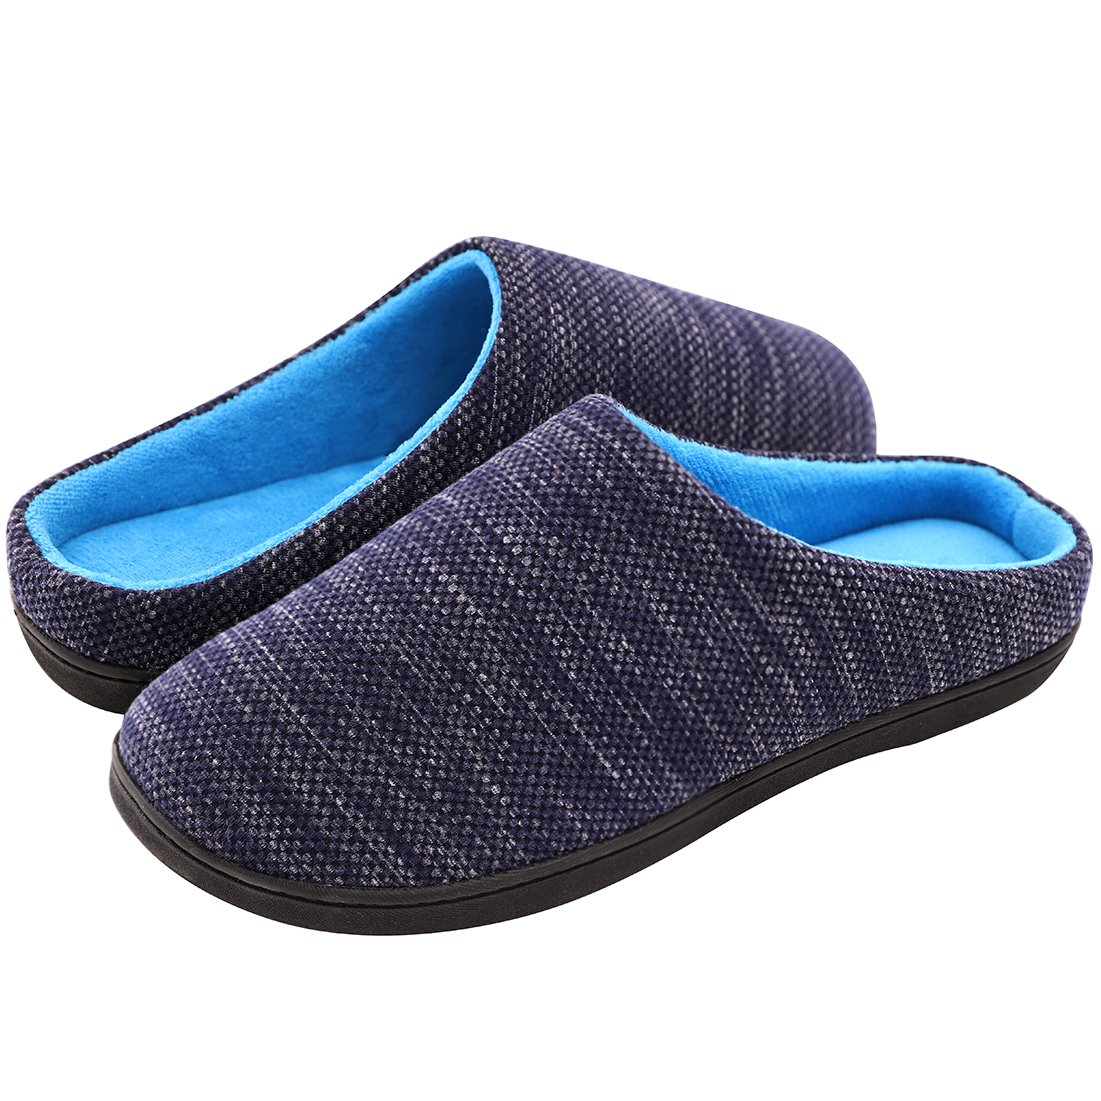 RockDove Men's Two-Tone Memory Foam Slipper(7-8 D(M) US, Denim/Blue)